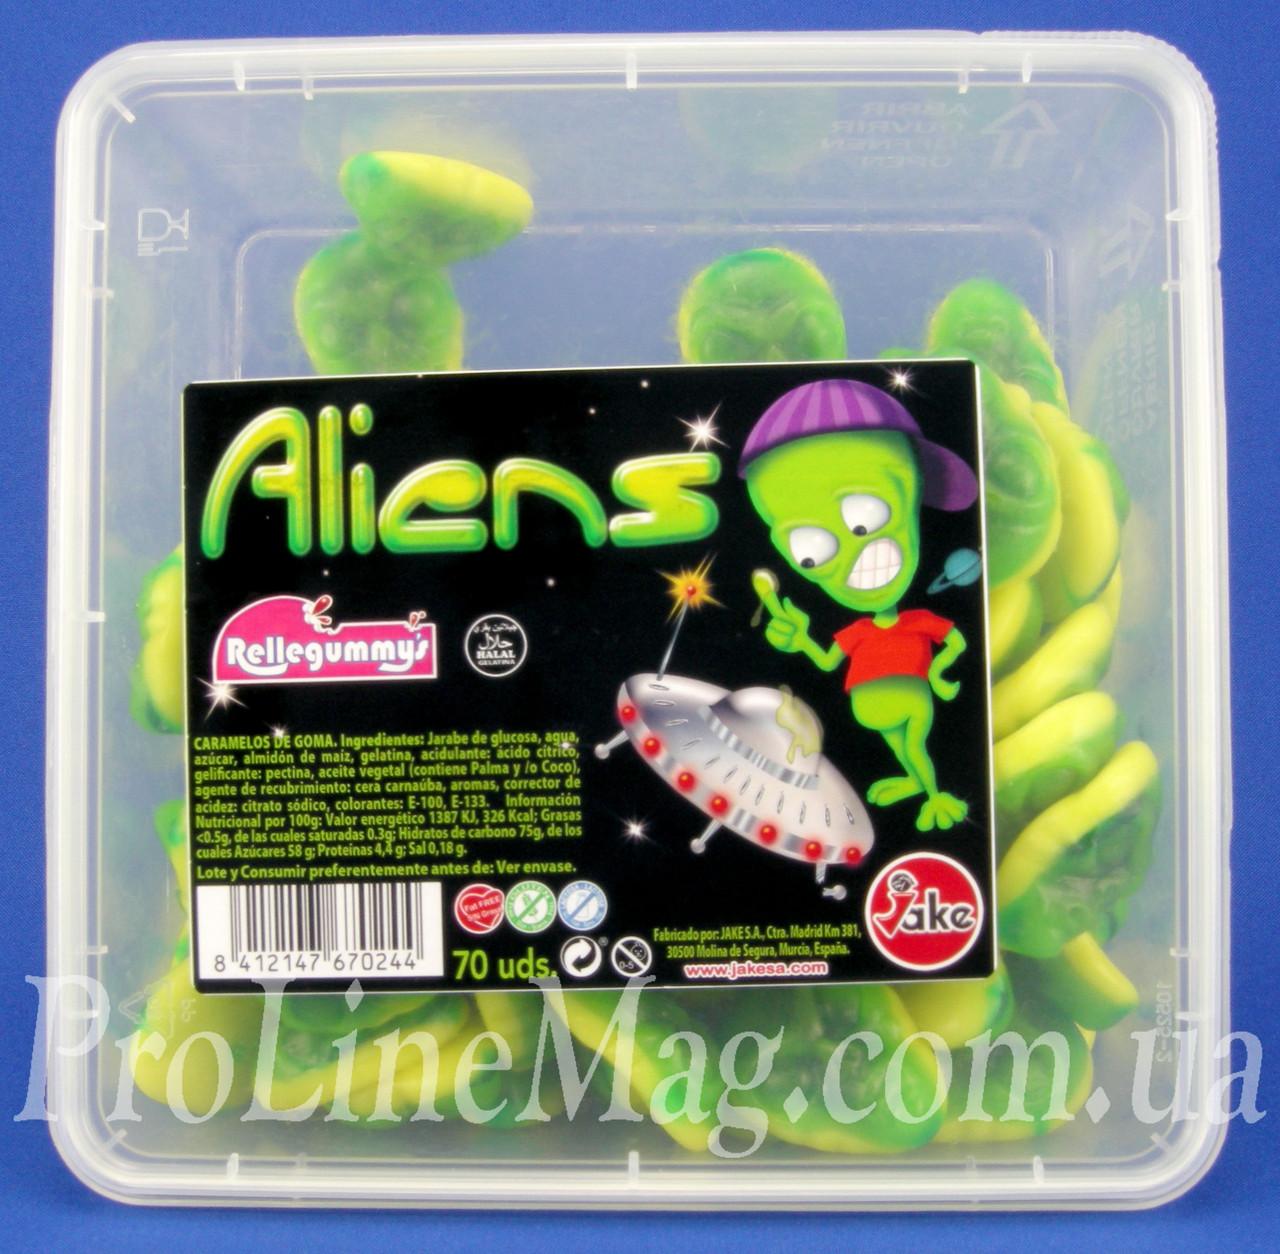 Жевательный Мармелад Инопланетянин Jake®Rellegummy'sAliens